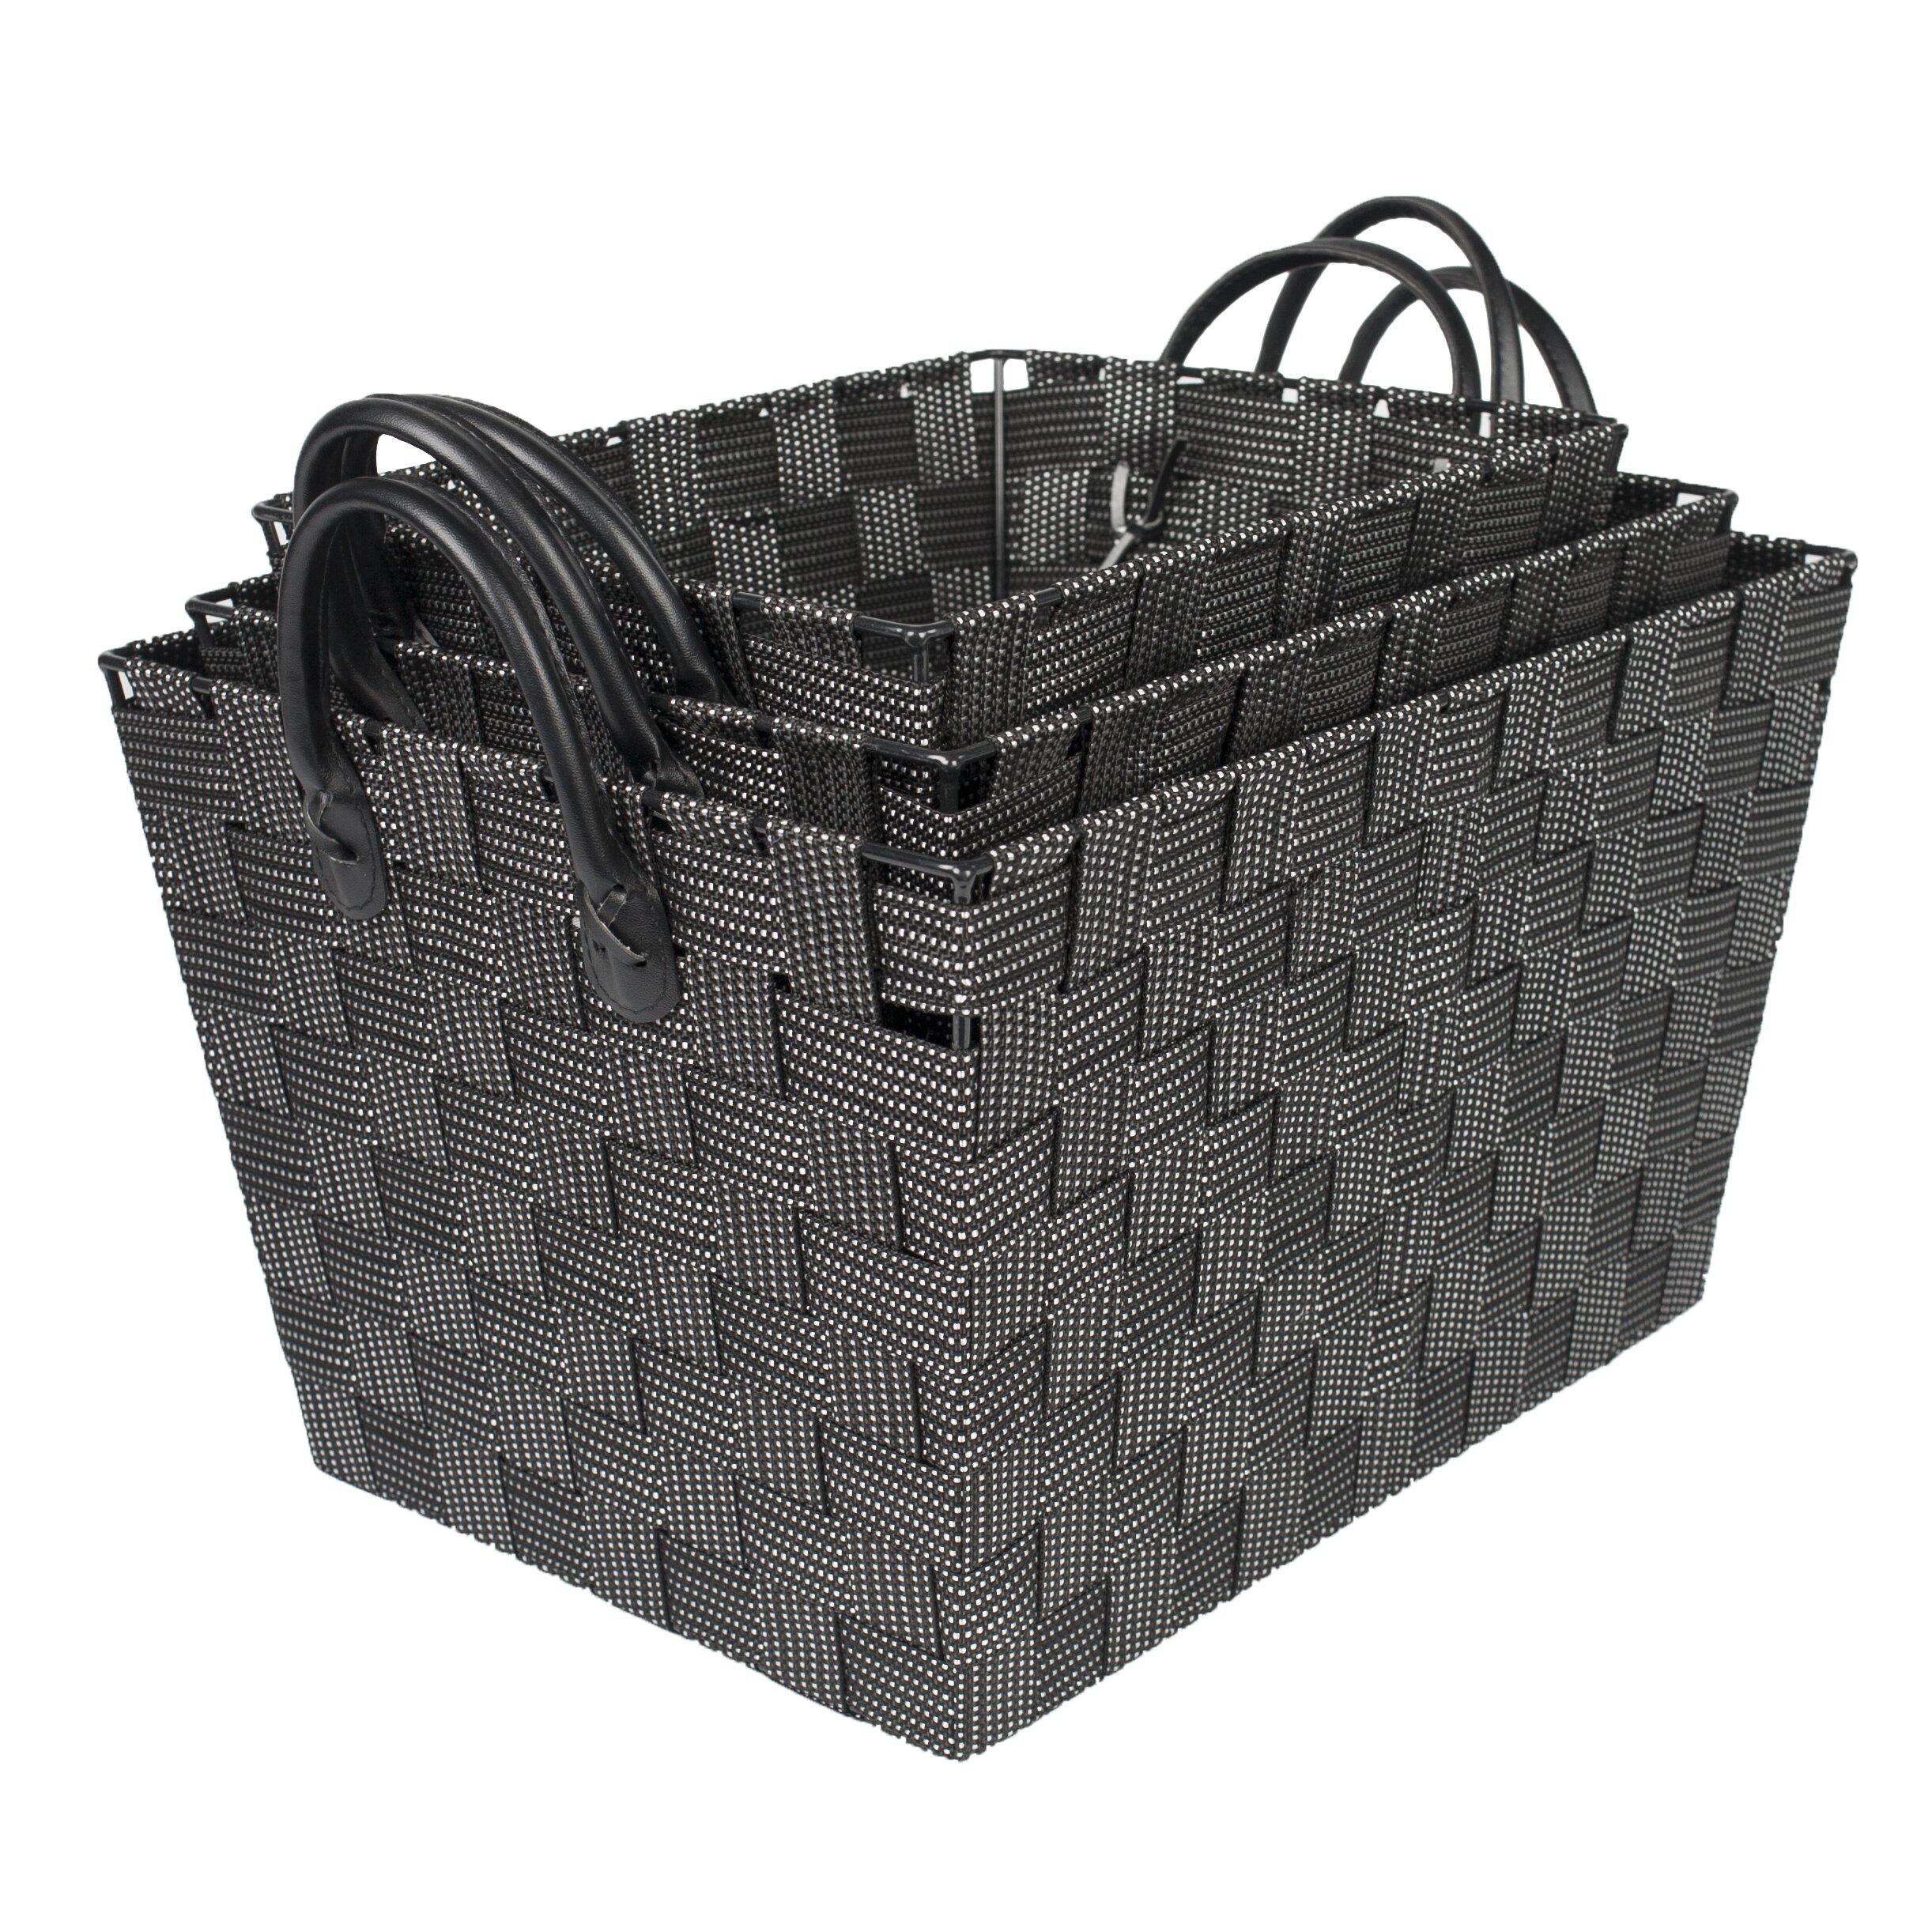 3 piece woven storage baskets with handles wayfair. Black Bedroom Furniture Sets. Home Design Ideas